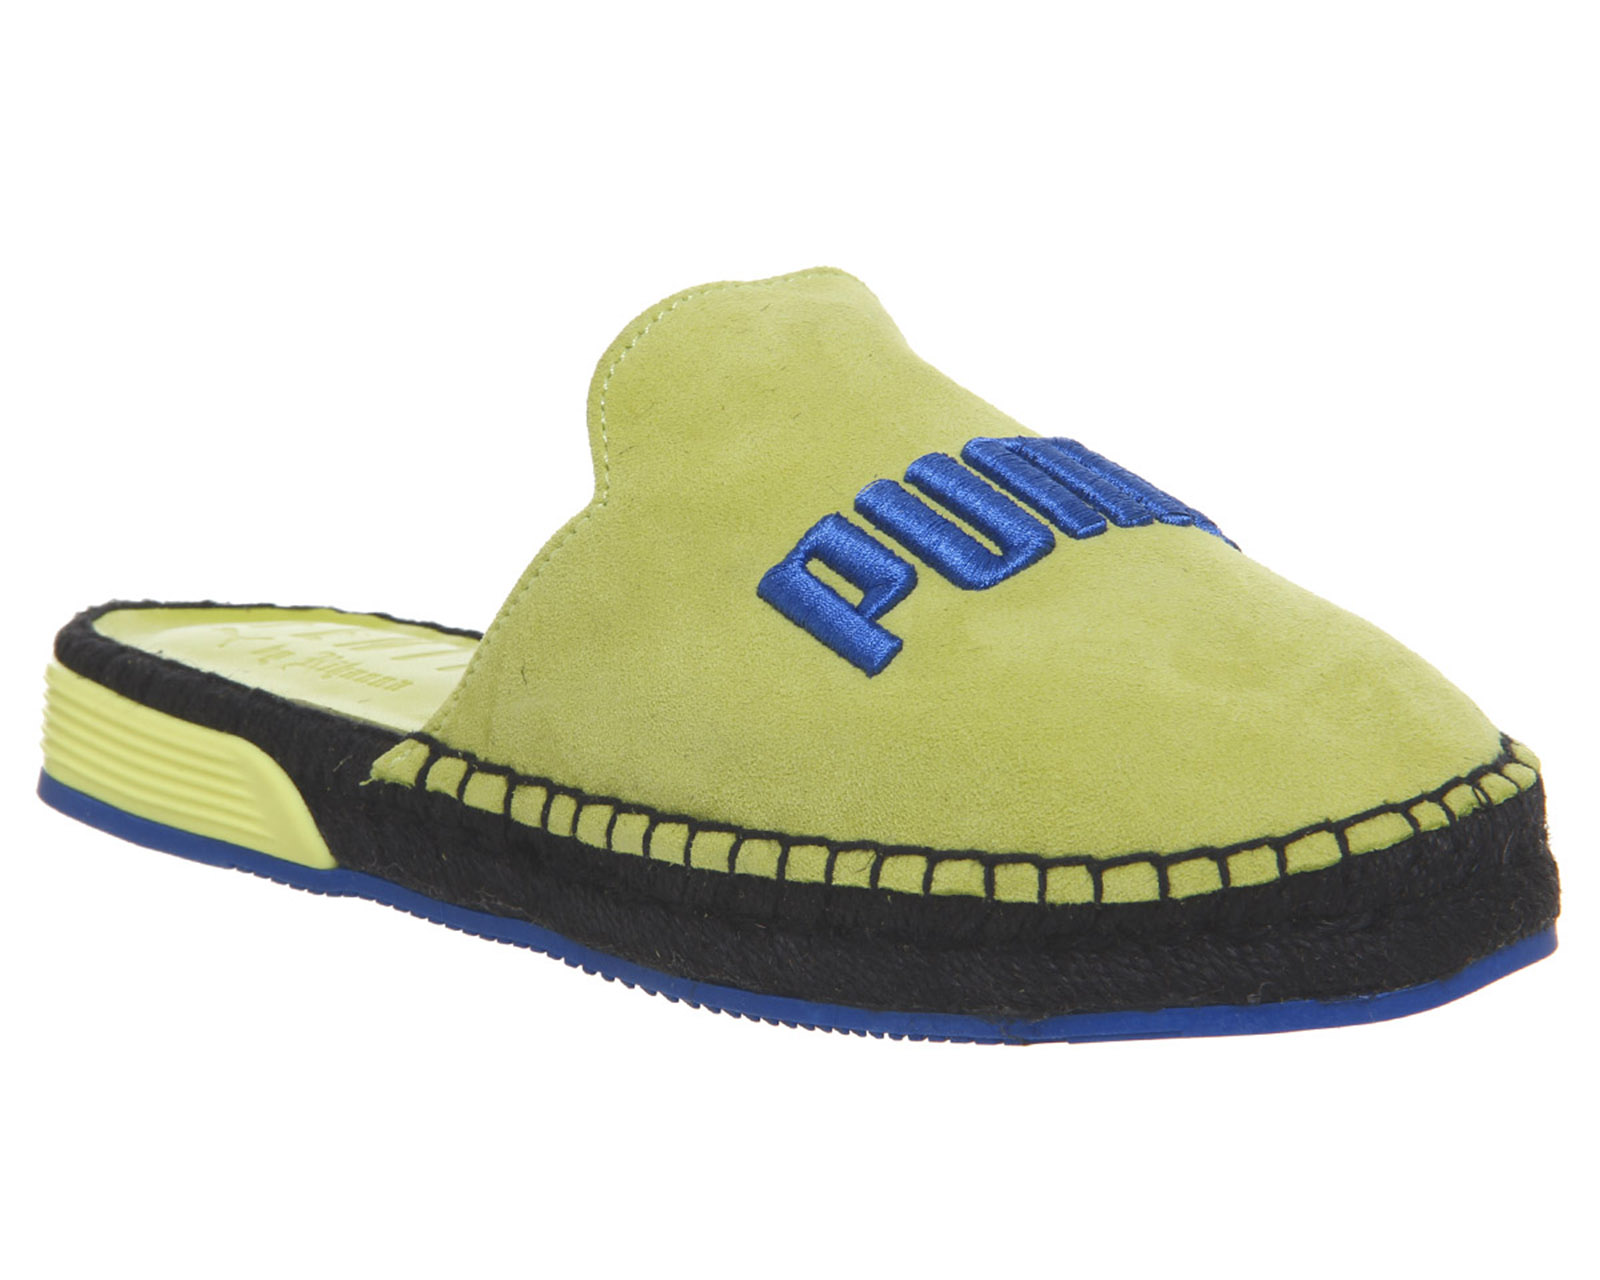 buy popular 0b274 190c7 Details about Womens Puma Fenty Espadrilles Sulphur Spring Blue Trainers  Shoes